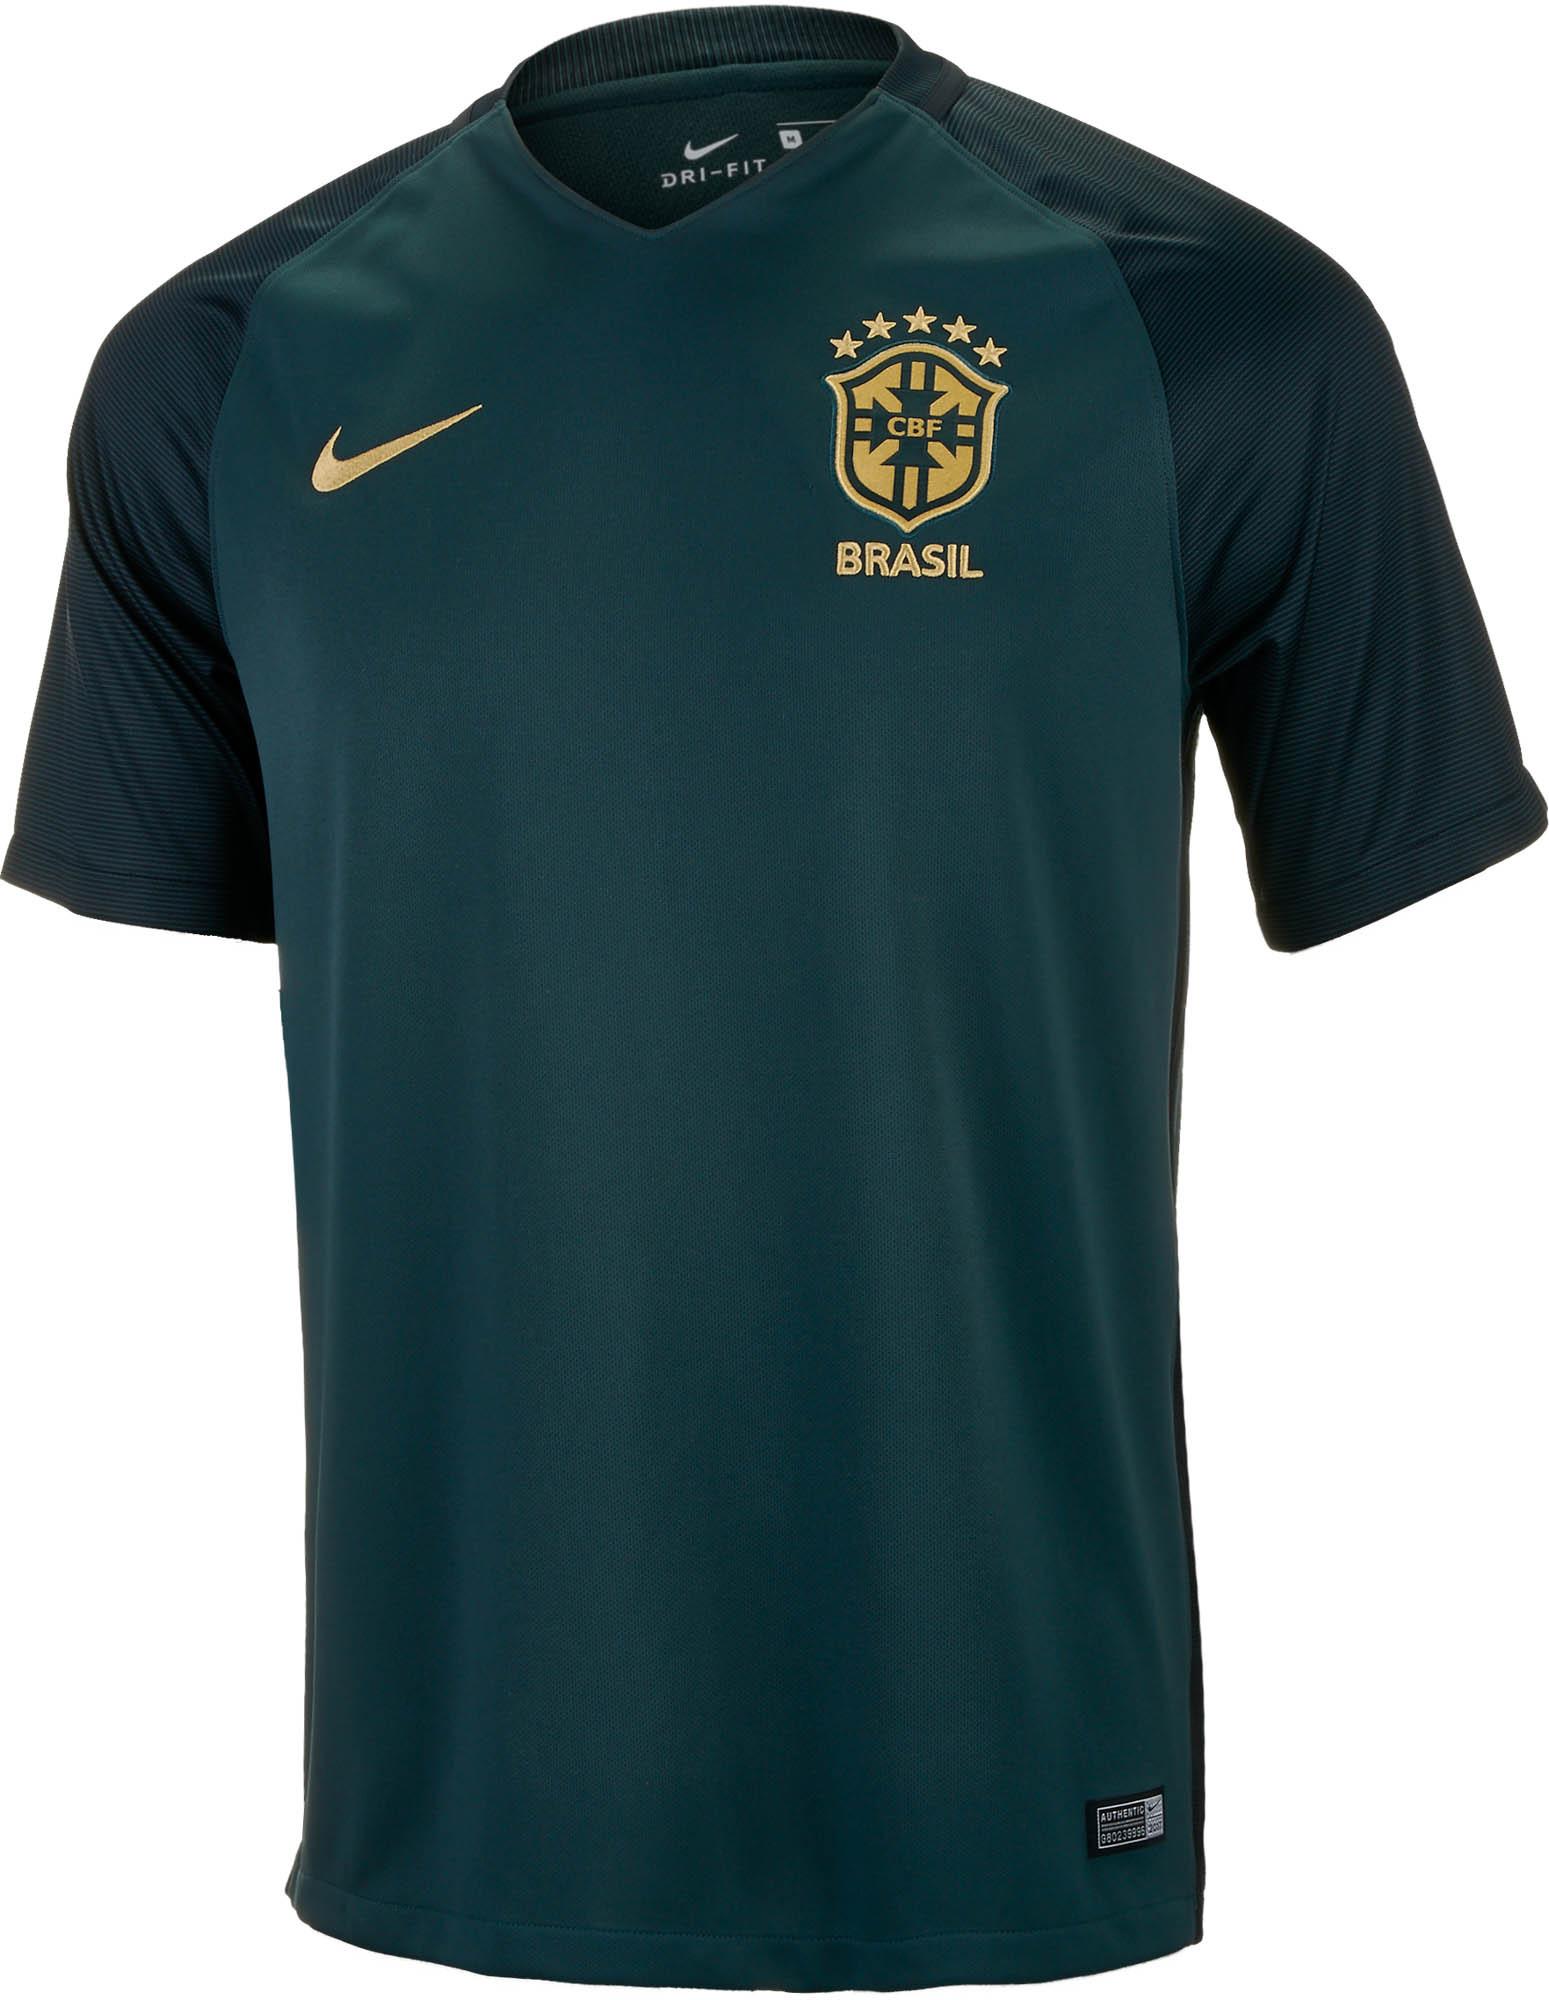 Nike Brazil 3rd Jersey 2017-18 - Soccer Master